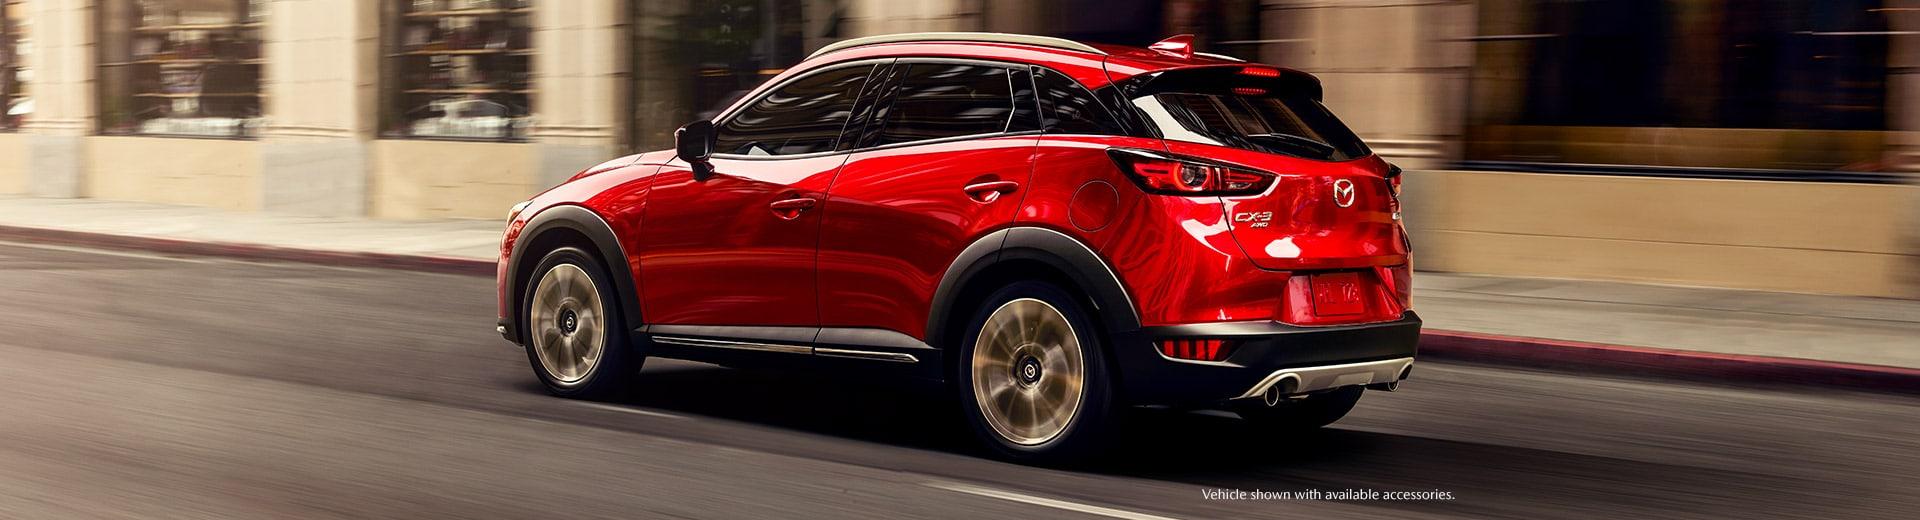 Mazda CX-3 2020 rouge